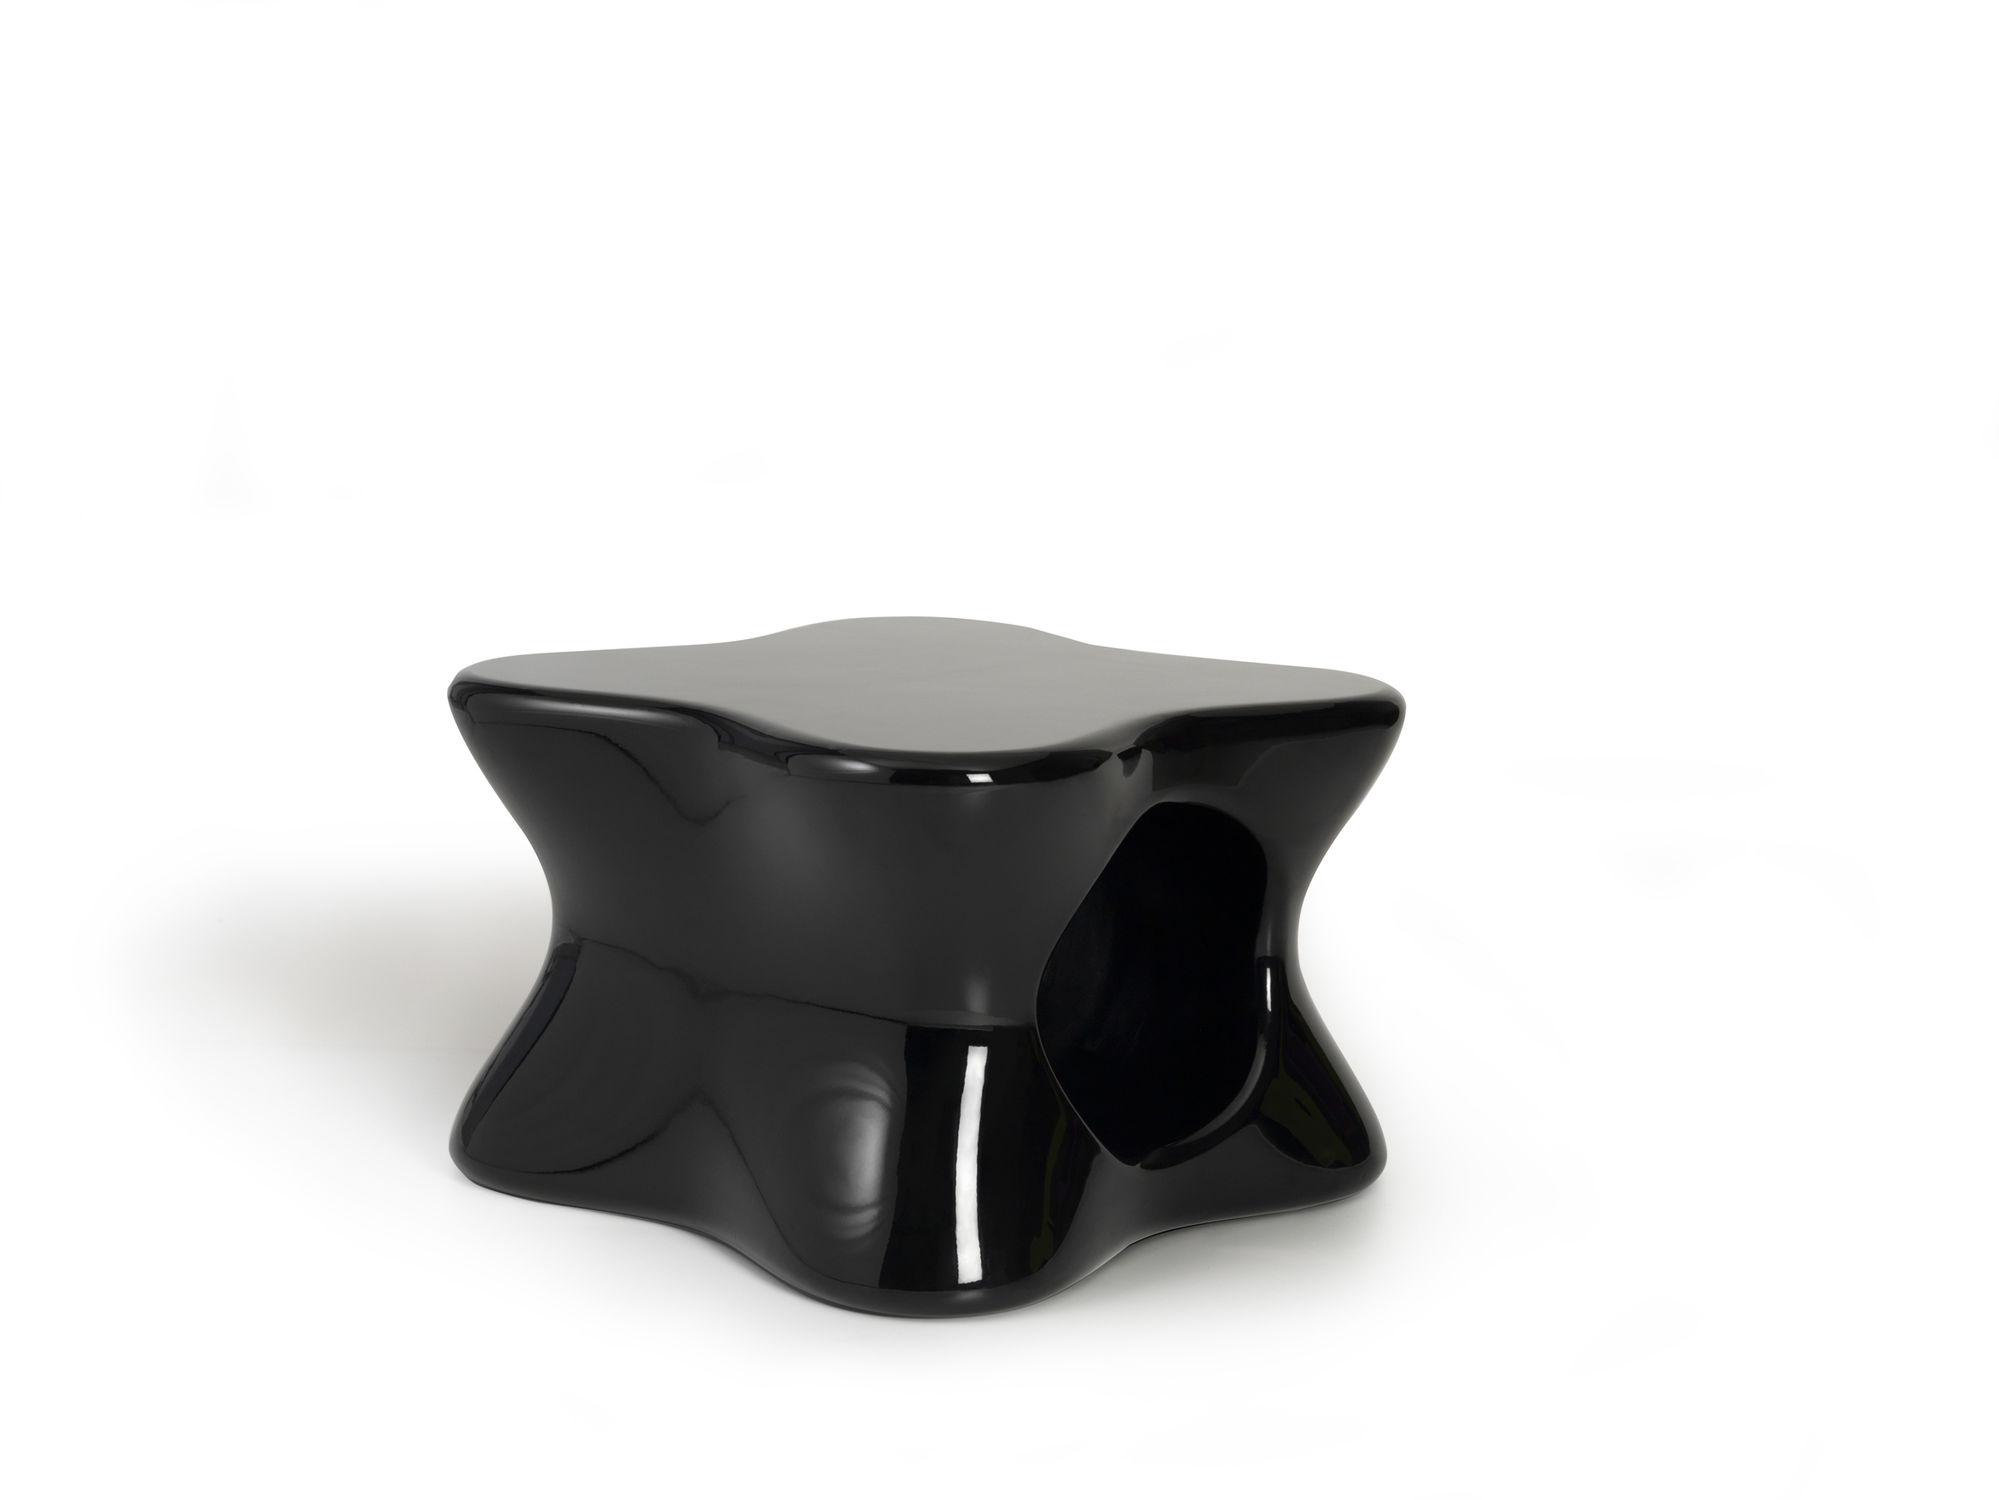 Table basse design original en polyéthyl¨ne de jardin